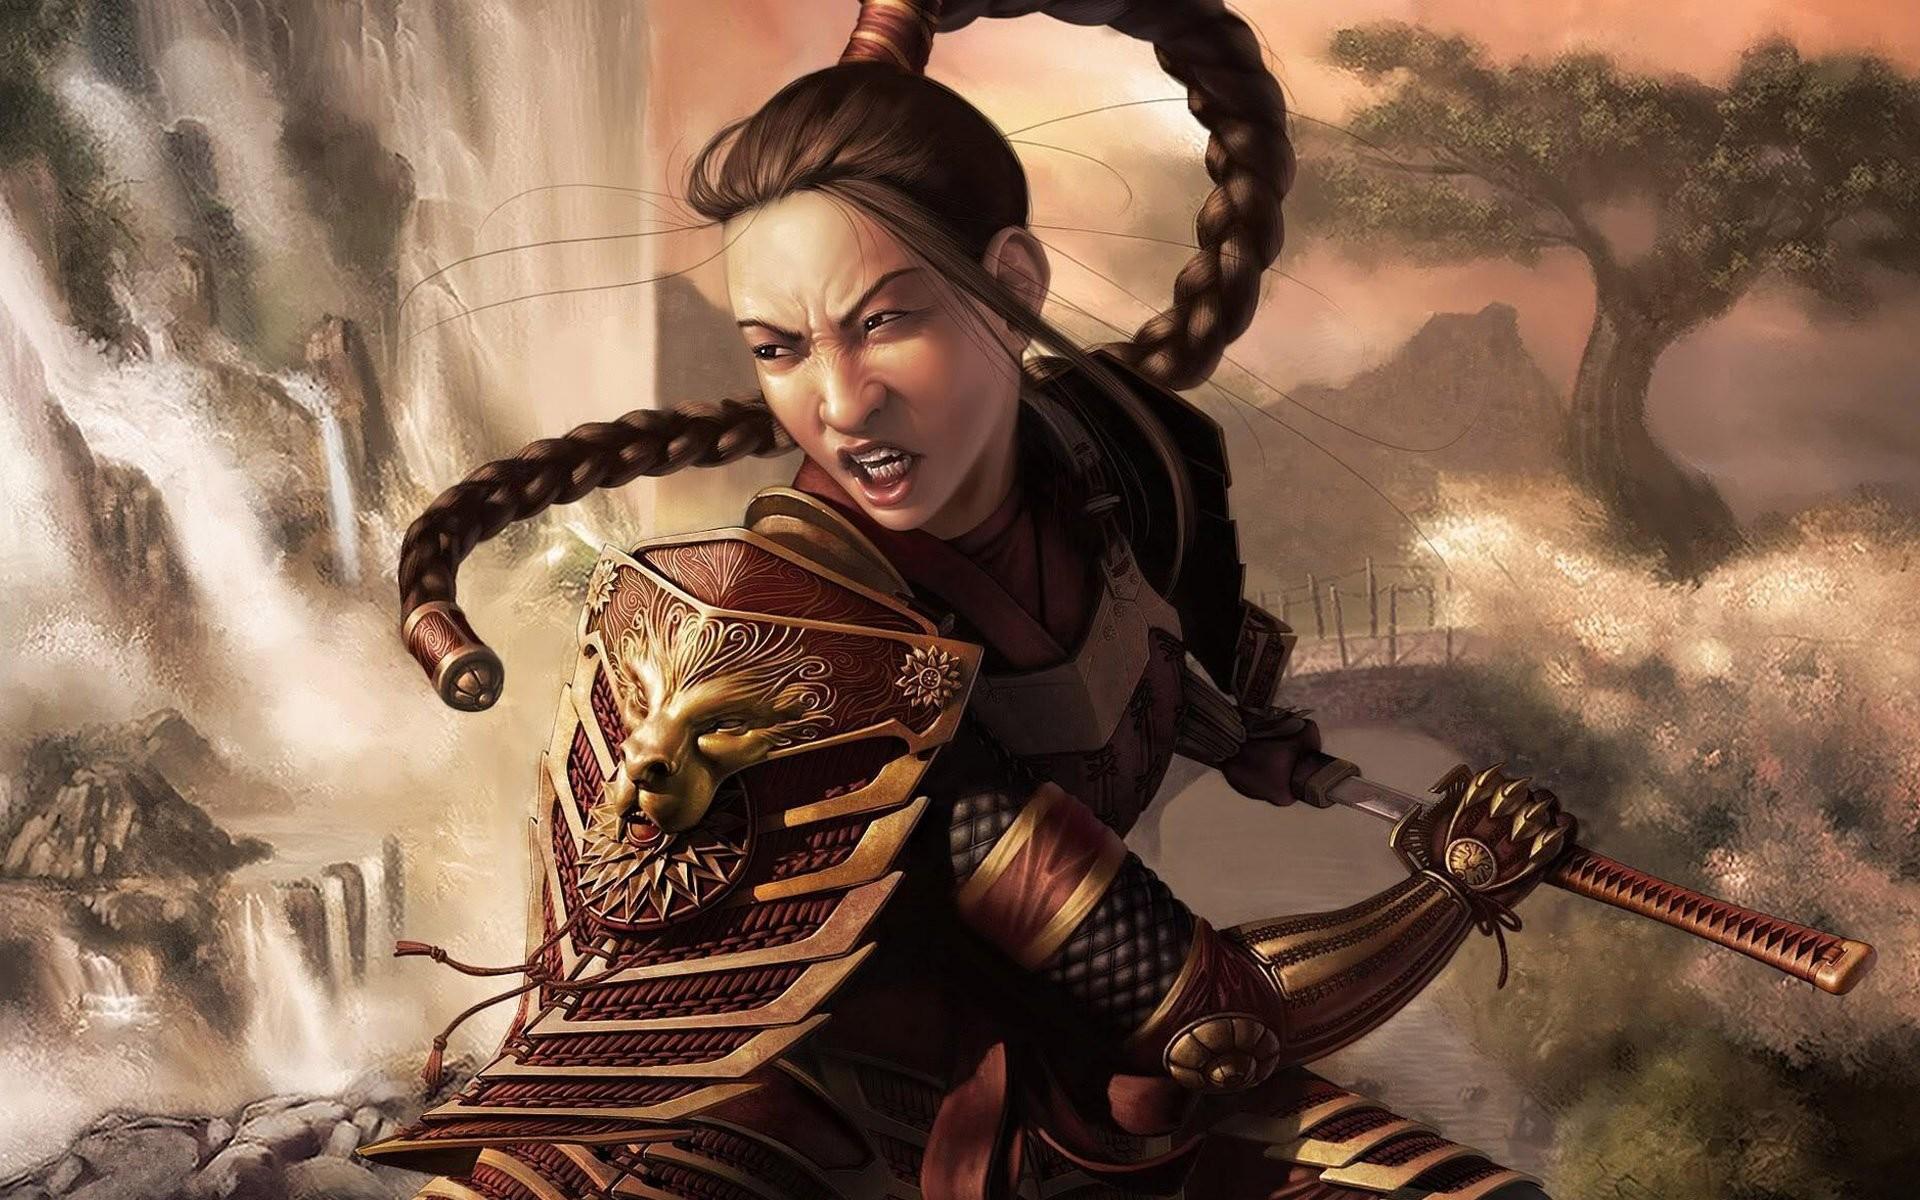 Warrior,Princess,Woman,wallpaper